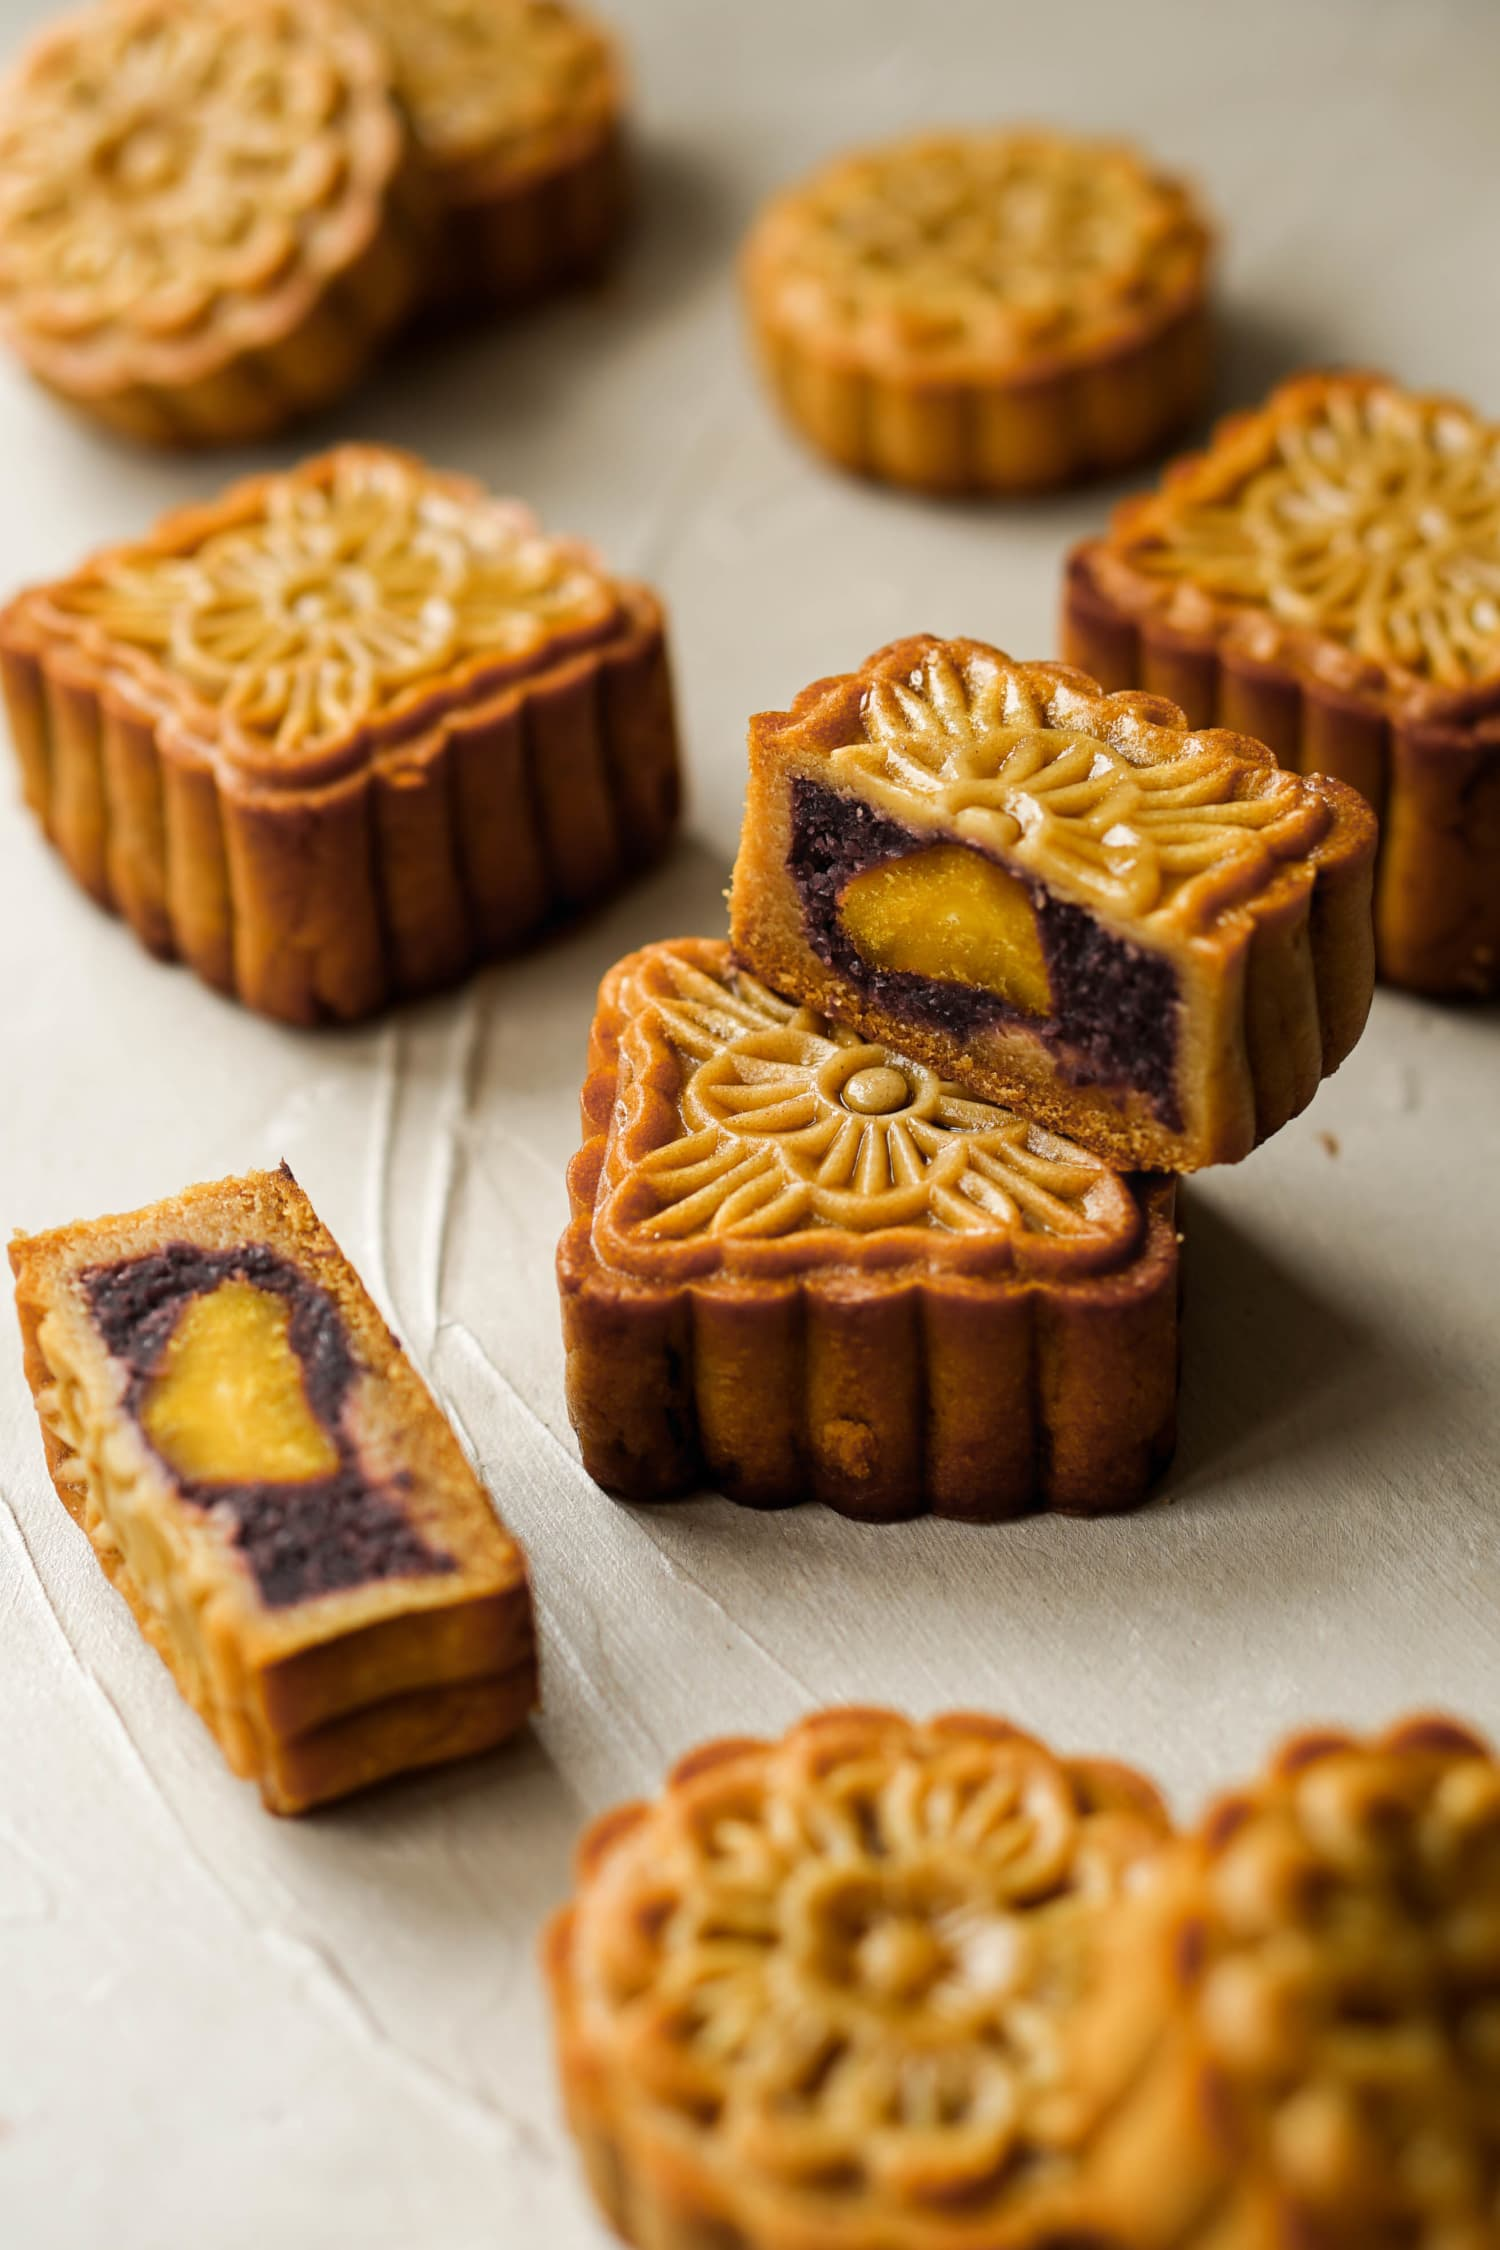 Celebrate Mid-Autumn Festival with Kristina Cho's Favorite Mooncake